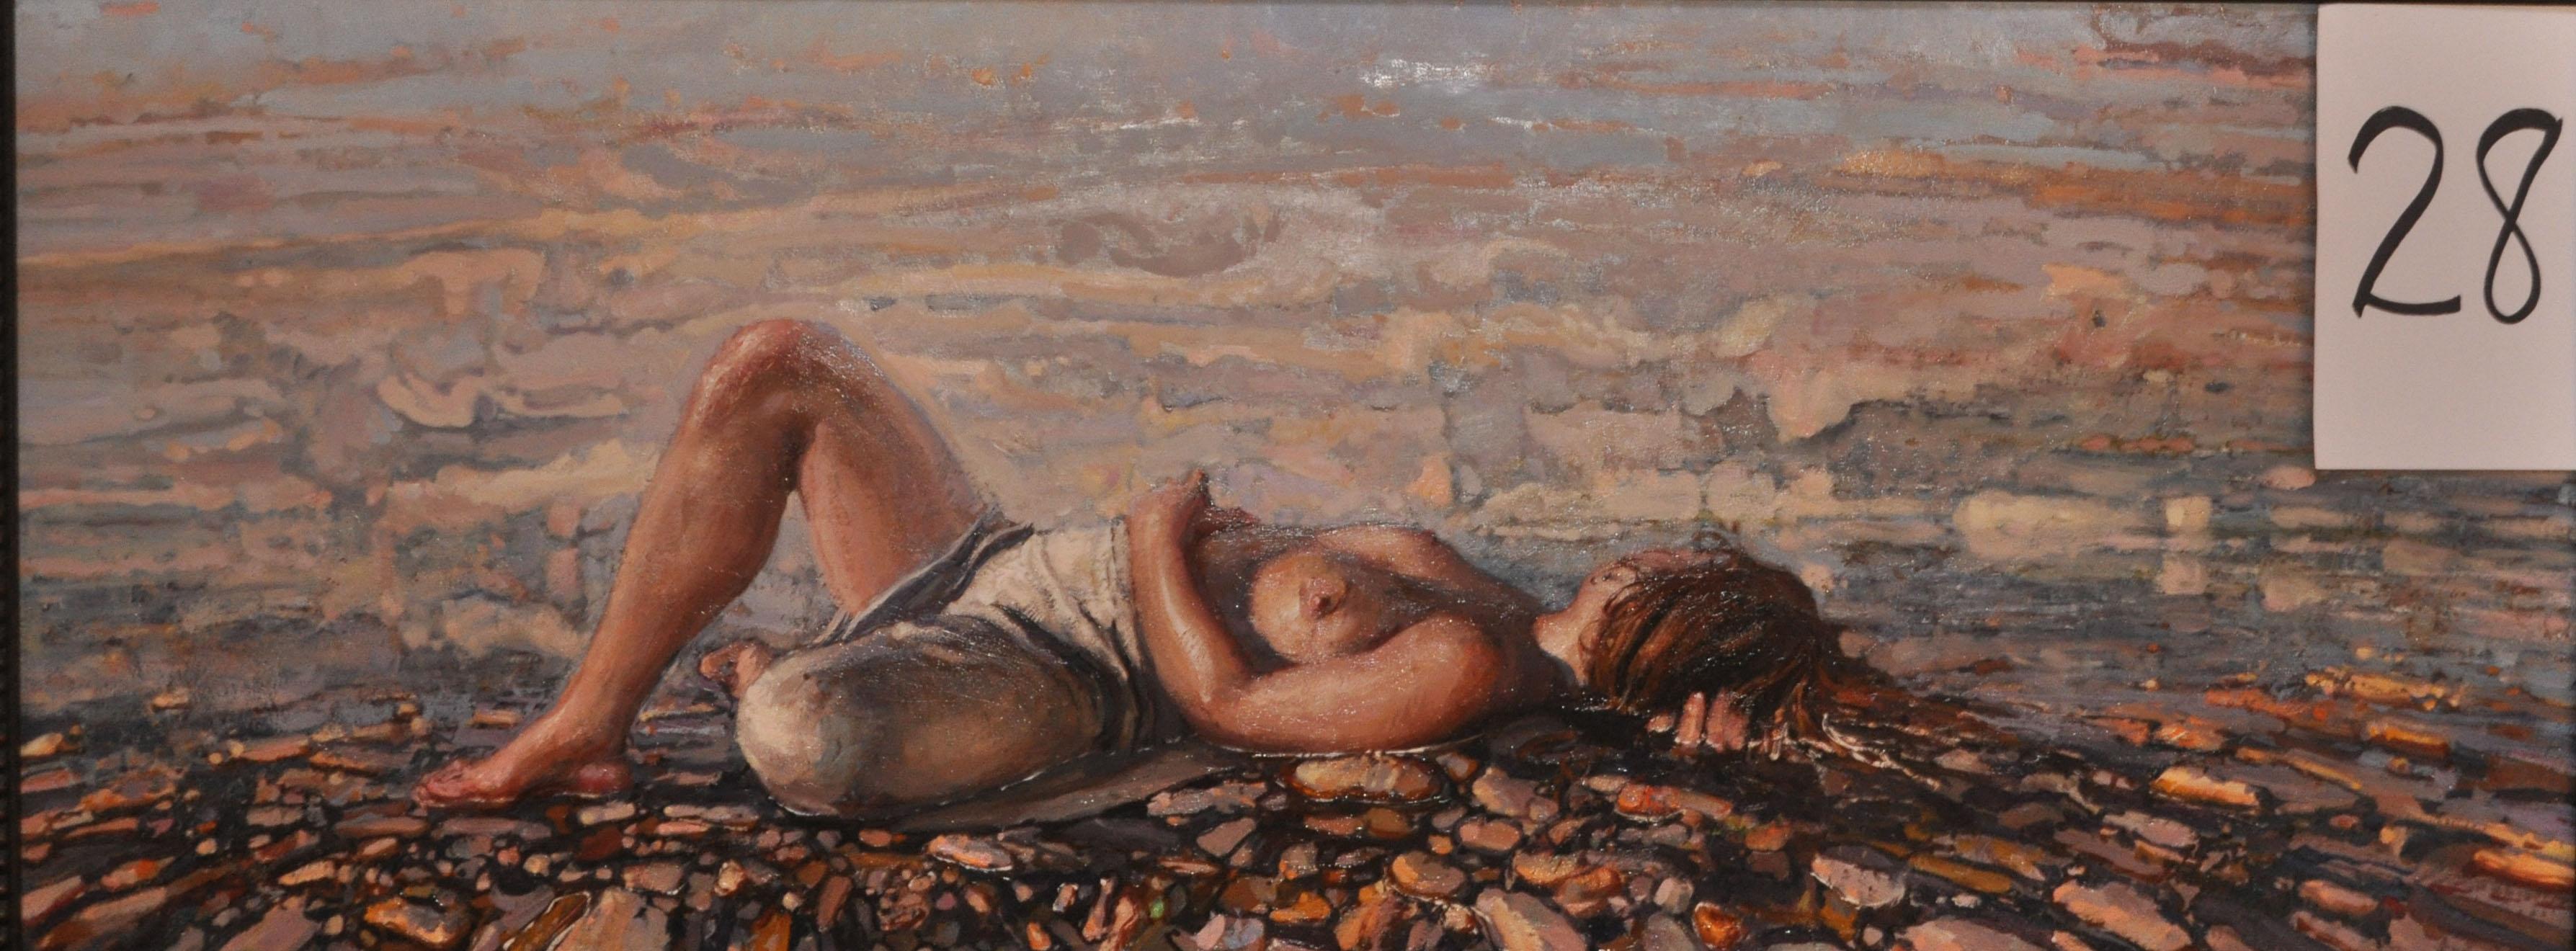 Change of Tide by  Daud Akhriev - Masterpiece Online